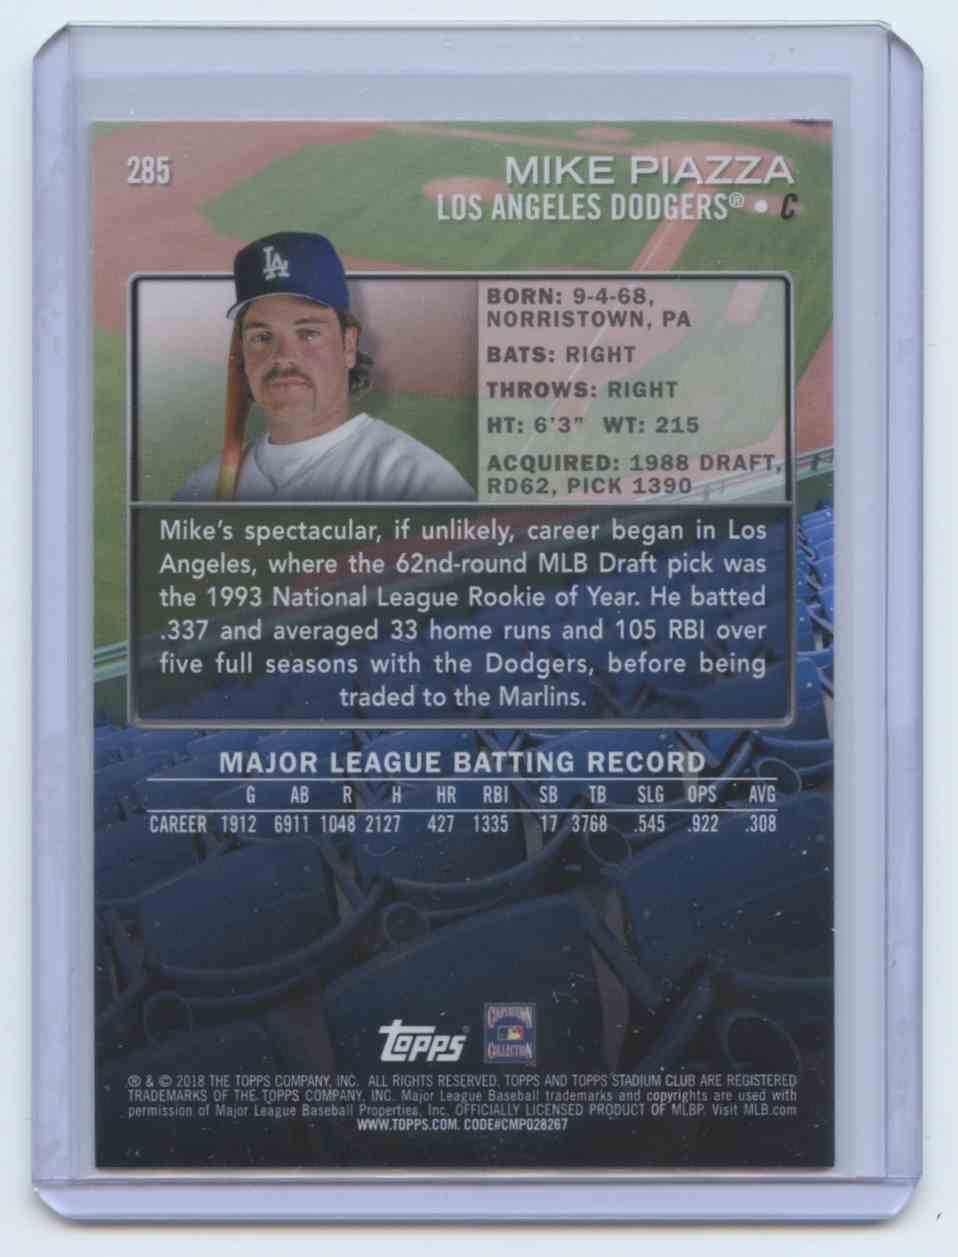 2018 Stadium Club Variation Mike Piazza Los Angeles Dodgers 285